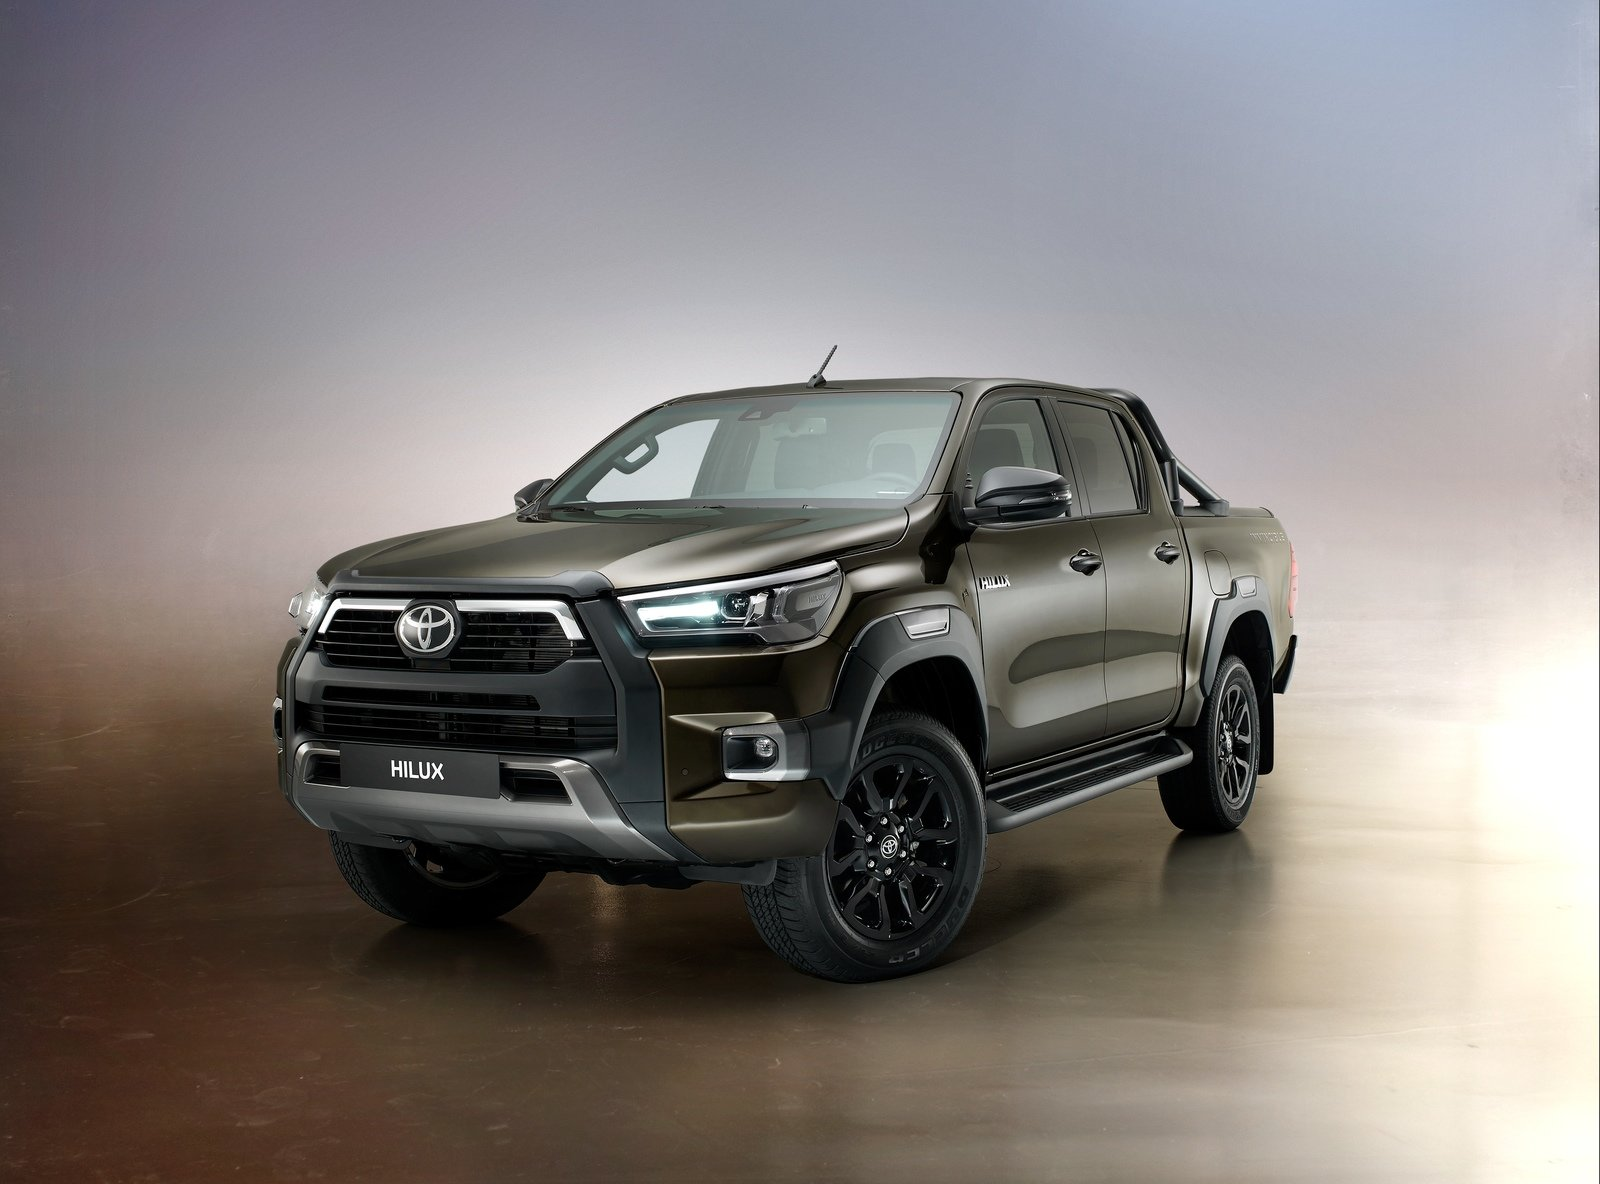 Price of 2021 Toyota Hilux in Nigeria